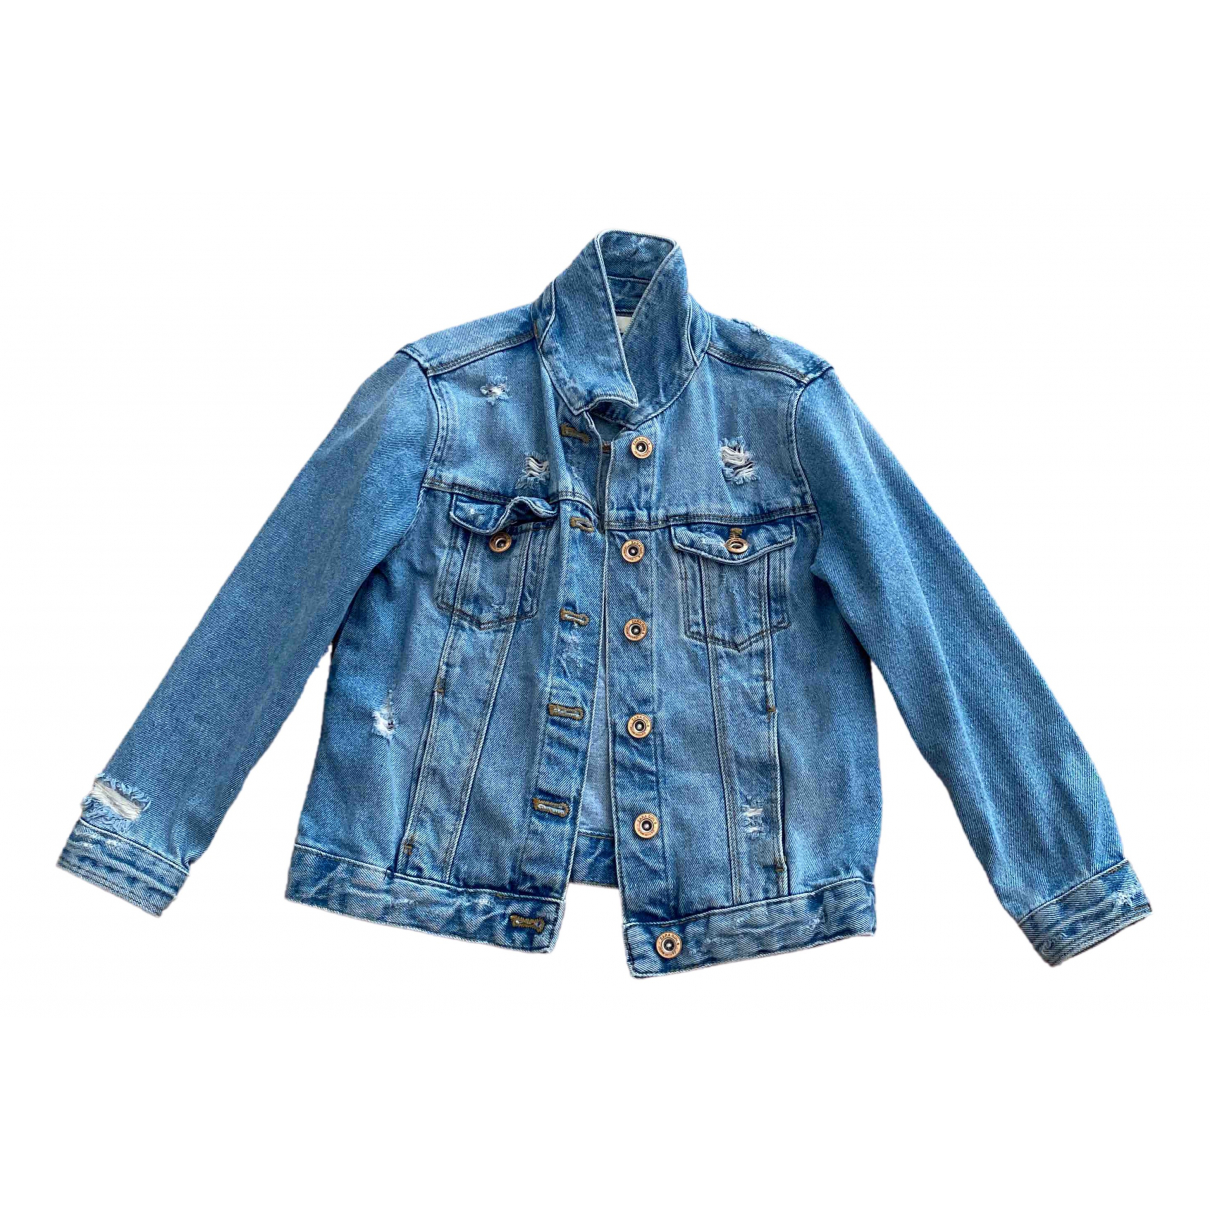 Zara \N Jacke, Maentel in Denim - Jeans